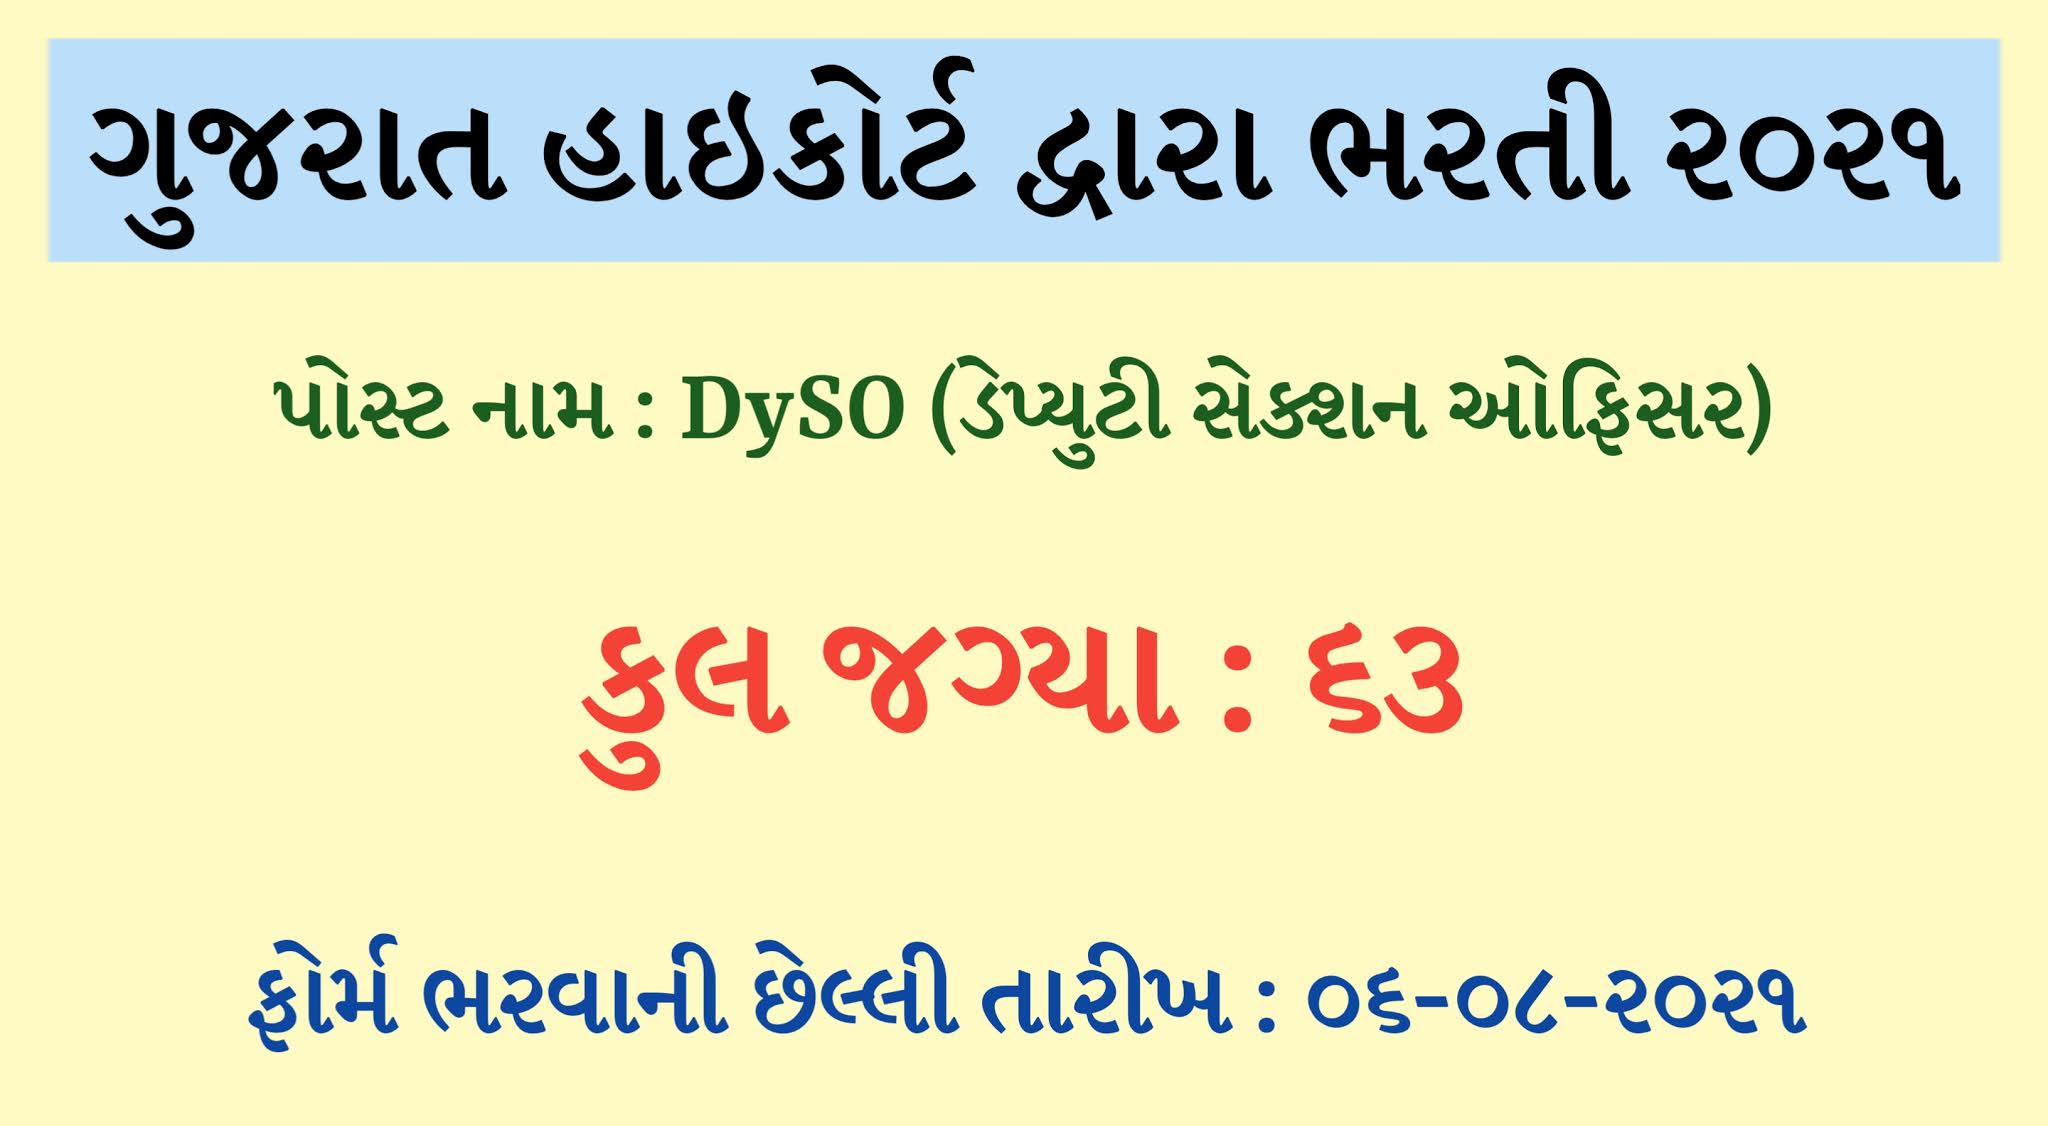 High Court of Gujarat Recruitment 2021   High Court of Gujarat DySO Recruitment 2021   High Court of Gujarat Deputy Section Officer Recruitment 2021   @gujarathighcourt.nic.in   @hc-ojas.gujarat.gov.in   DySO   DySO Recruitment 2021   DySO exam date 2021   DySO result 2021   High Court DySO Recruitment   Gujarat High Court DySO Recruitment 2021   Deputy Section Officer Recruitment 2021   DySO Salary 2021   DySO Salary   DySO Salary in Gujarat   Gujarat High Court Recruitment 2021